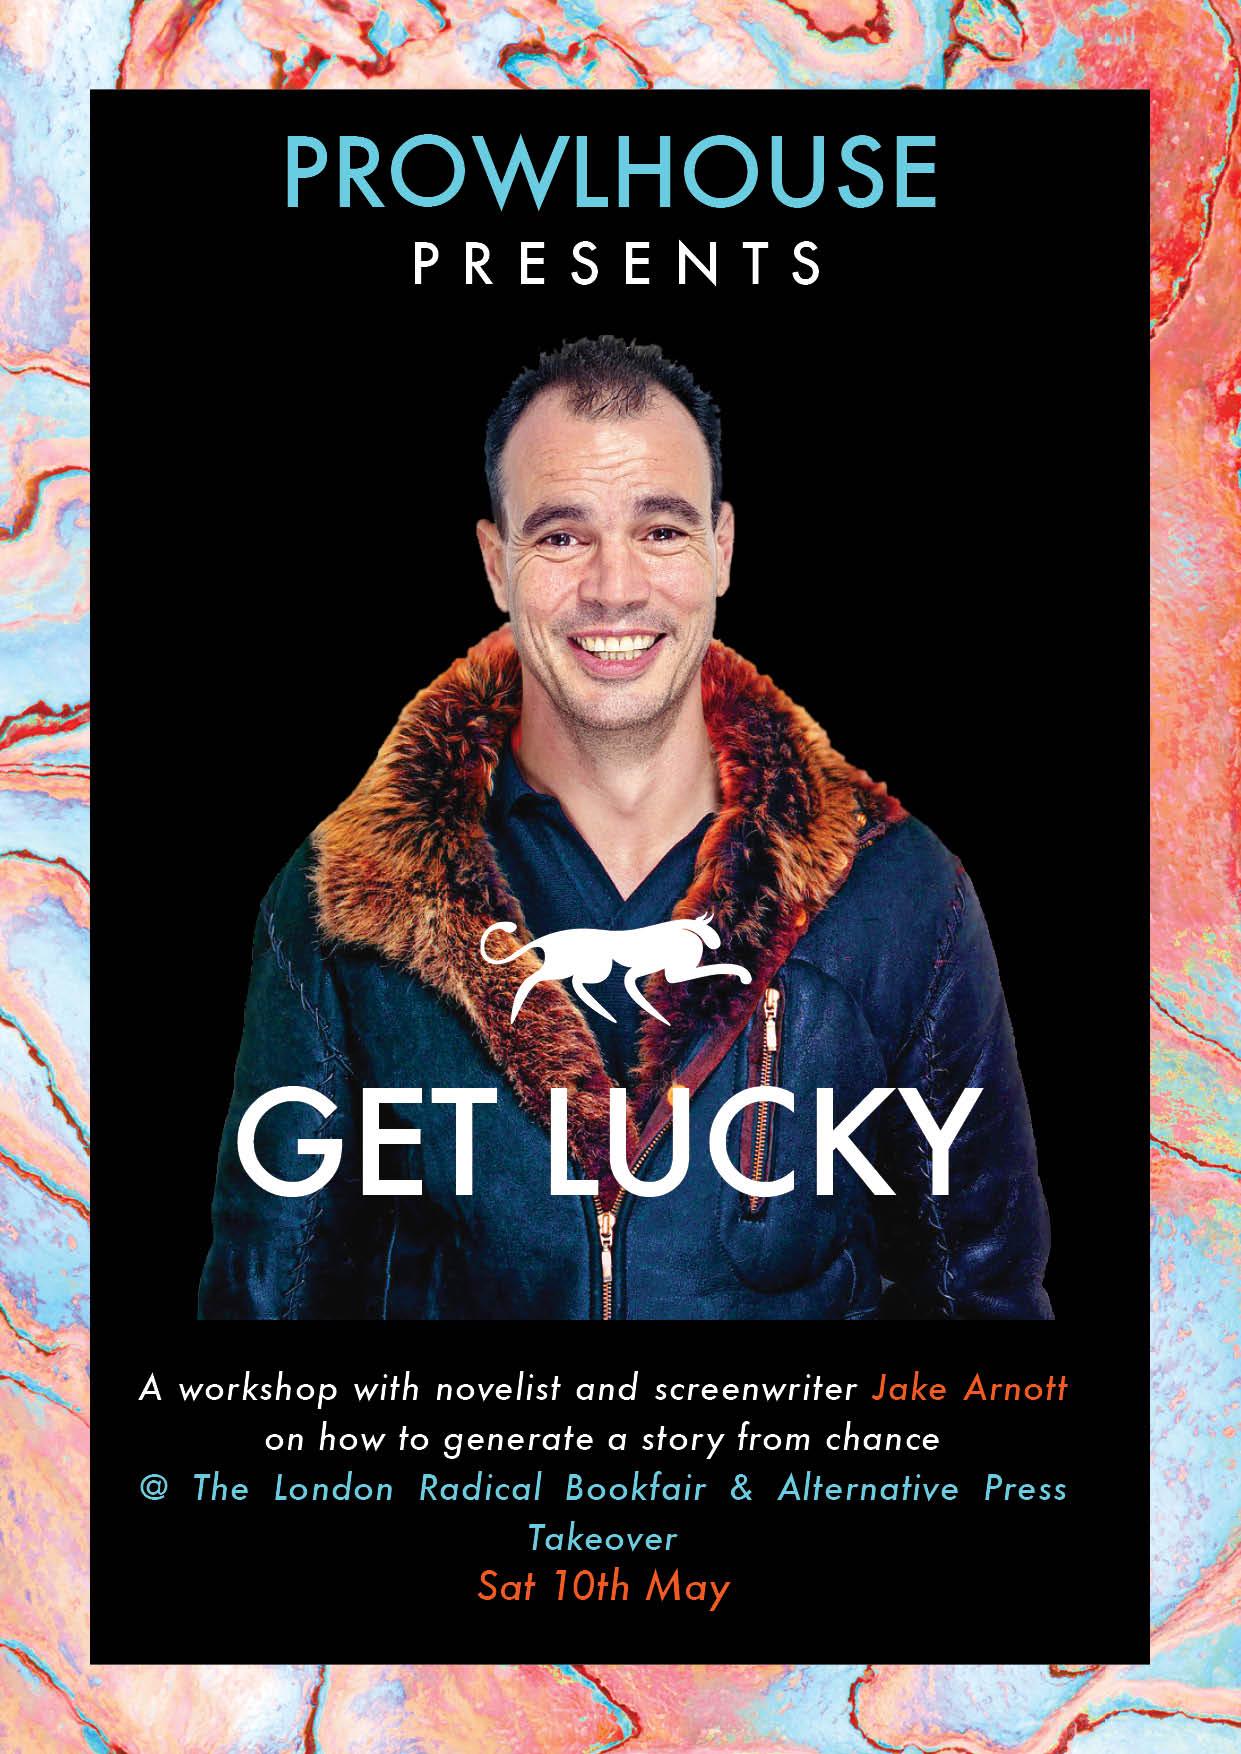 Get Lucky Workshop